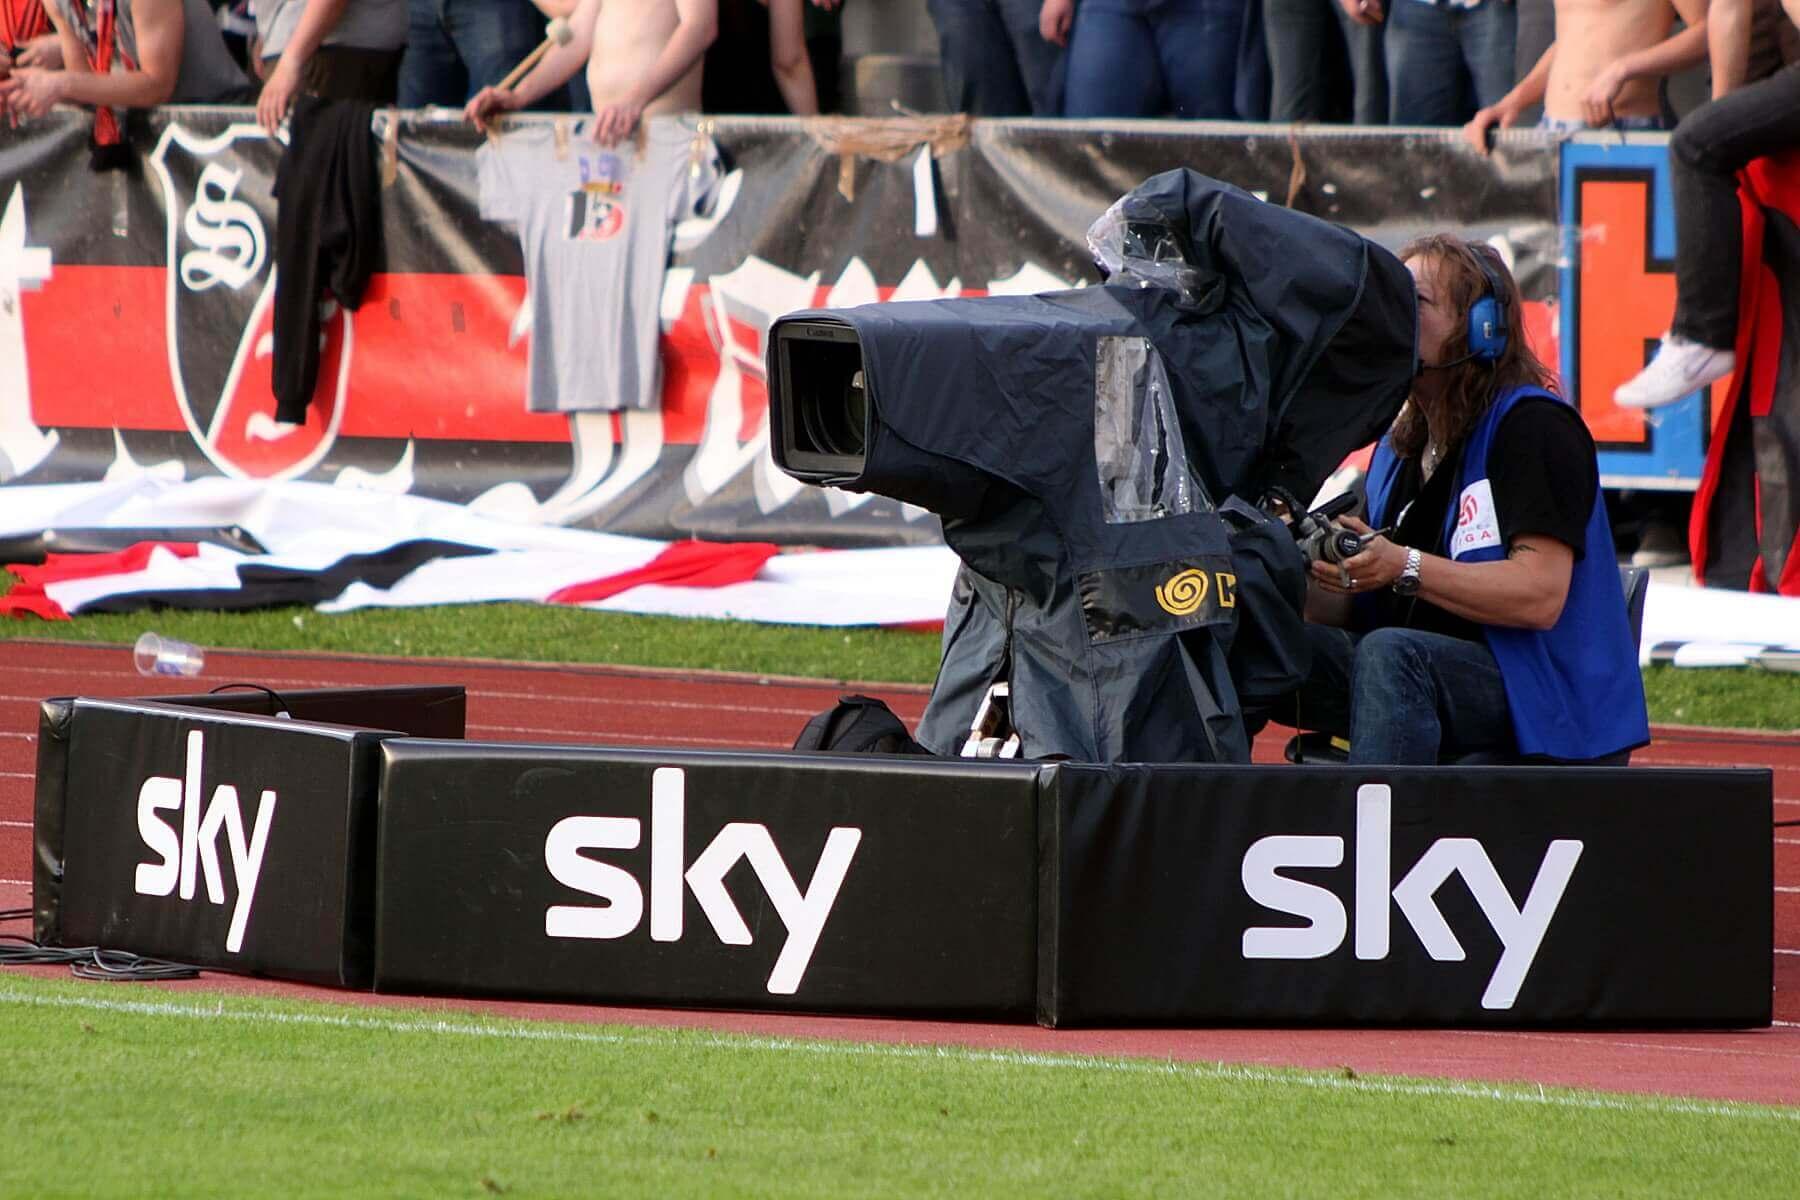 Sky TV camera at sports event